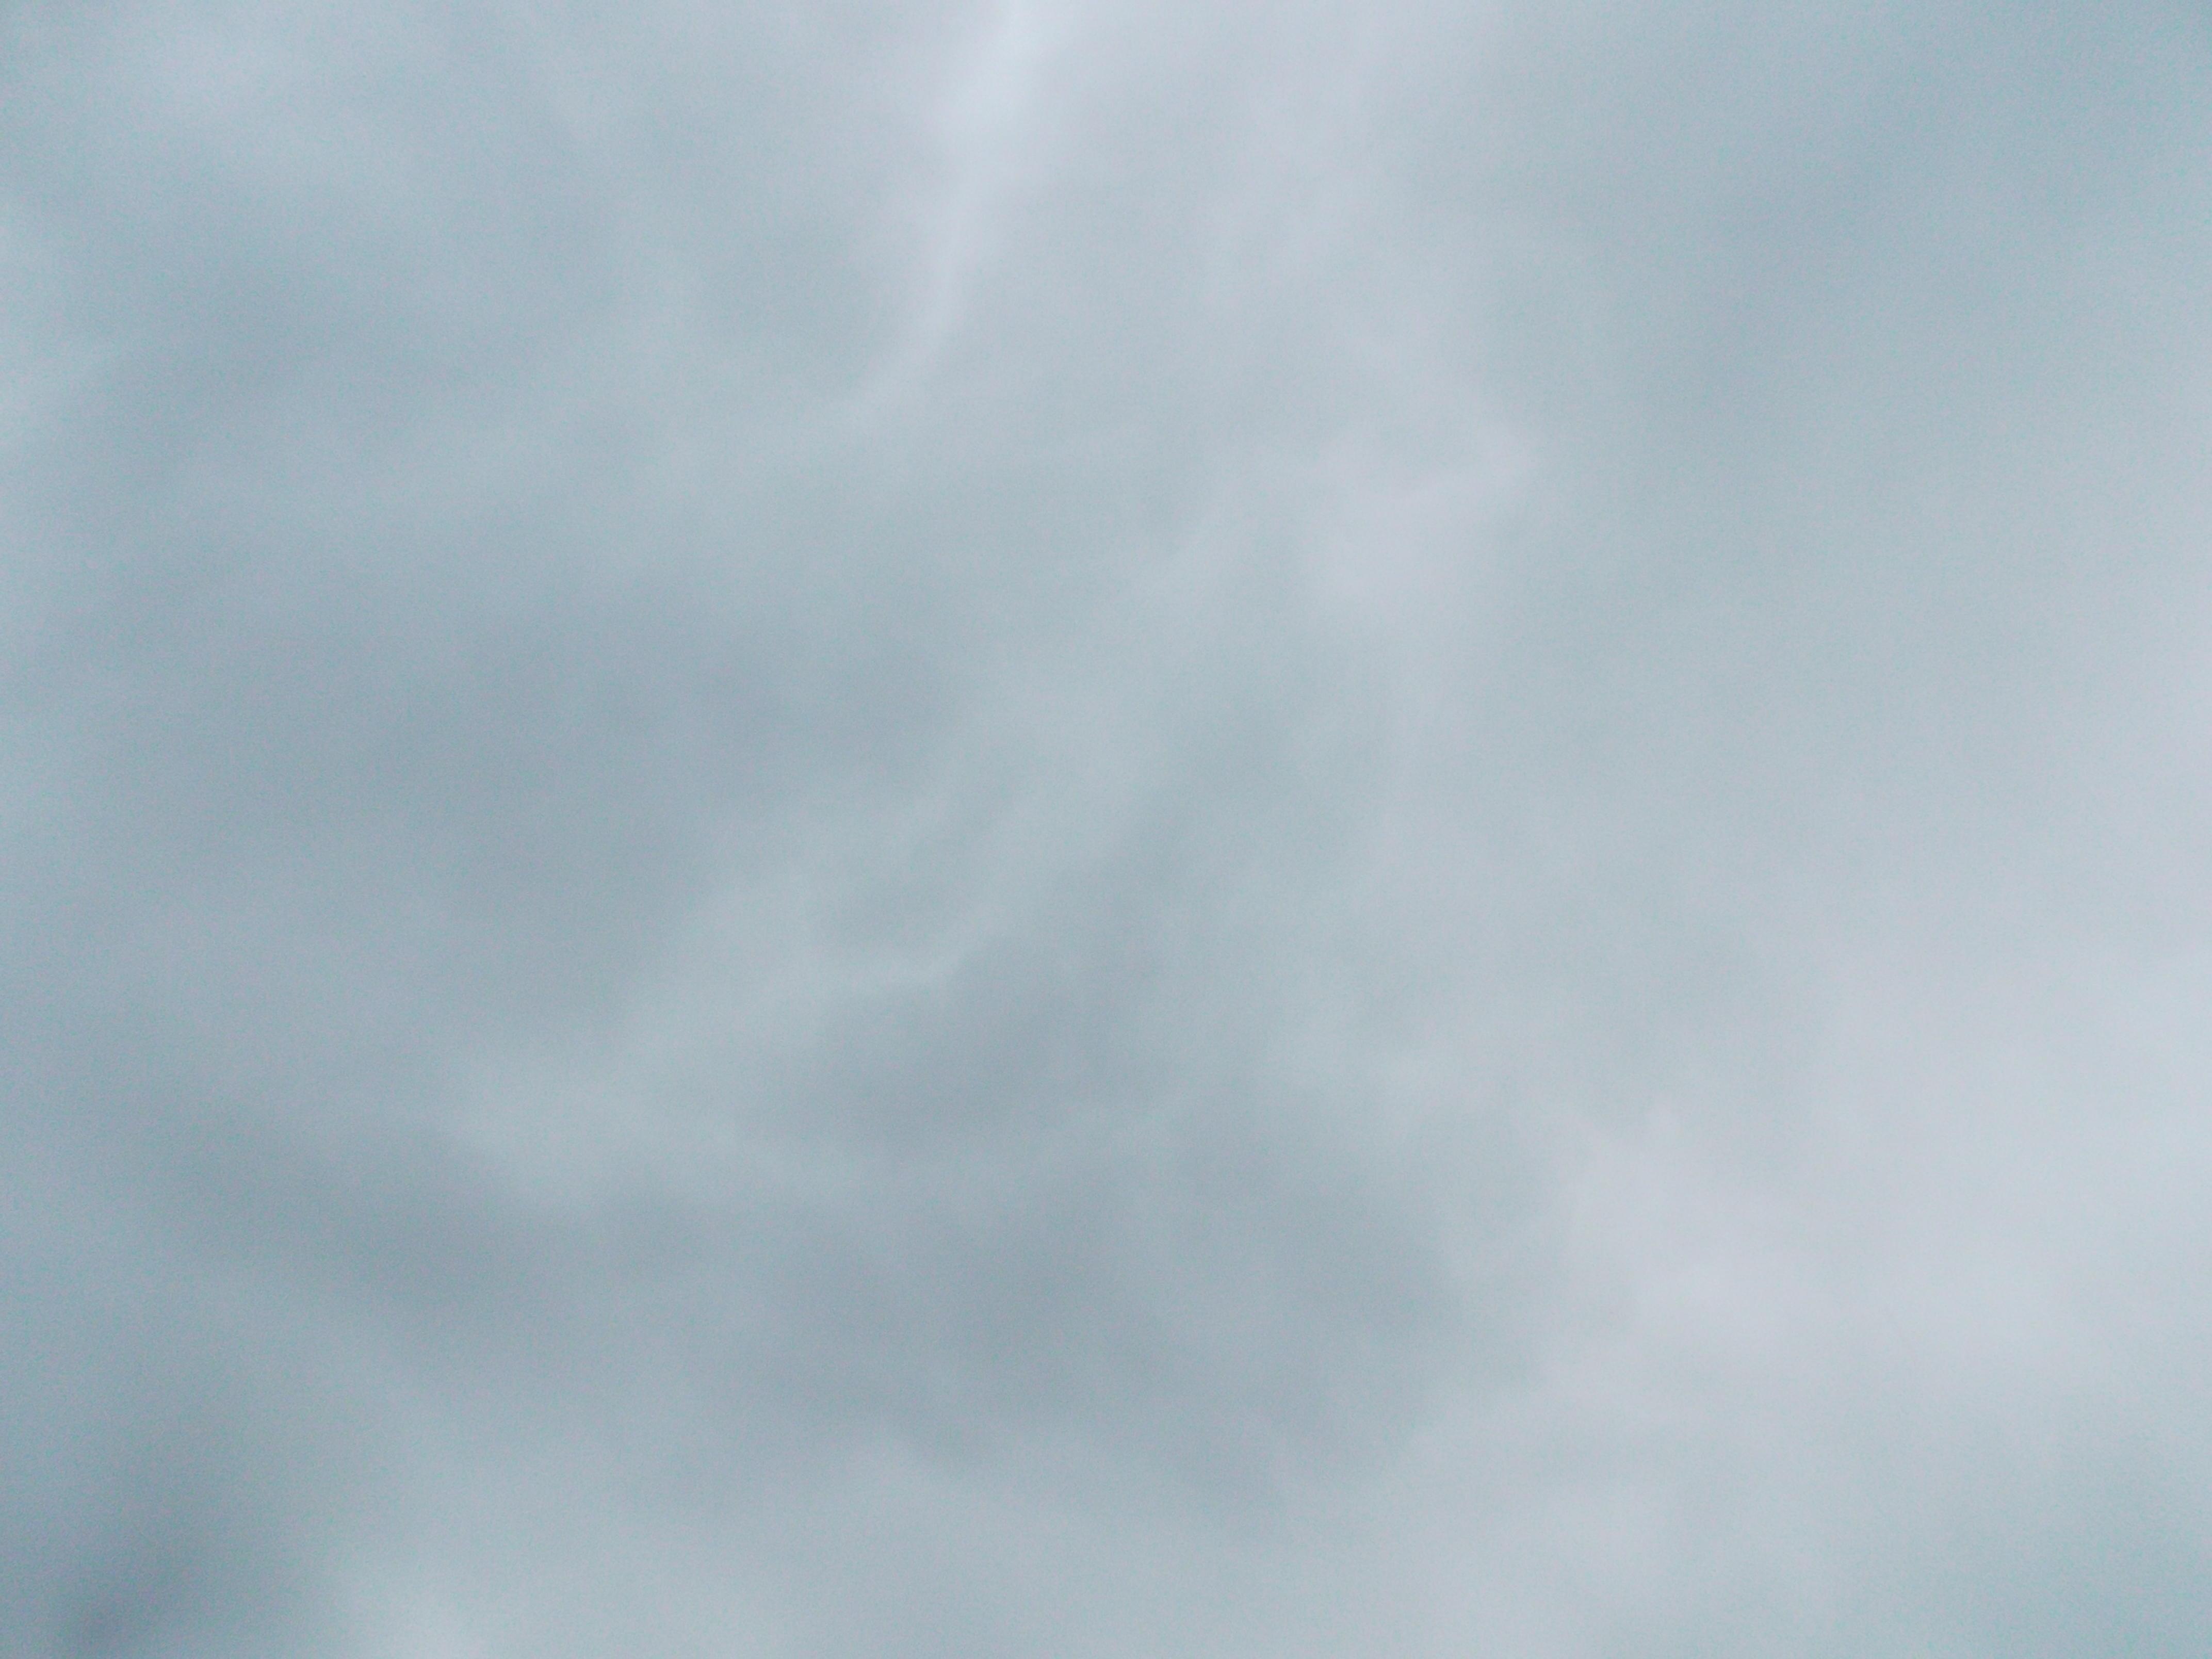 2013-04-12 Longitude -0.371 Latitude 49.182 Altitude 29 Heure 14h14